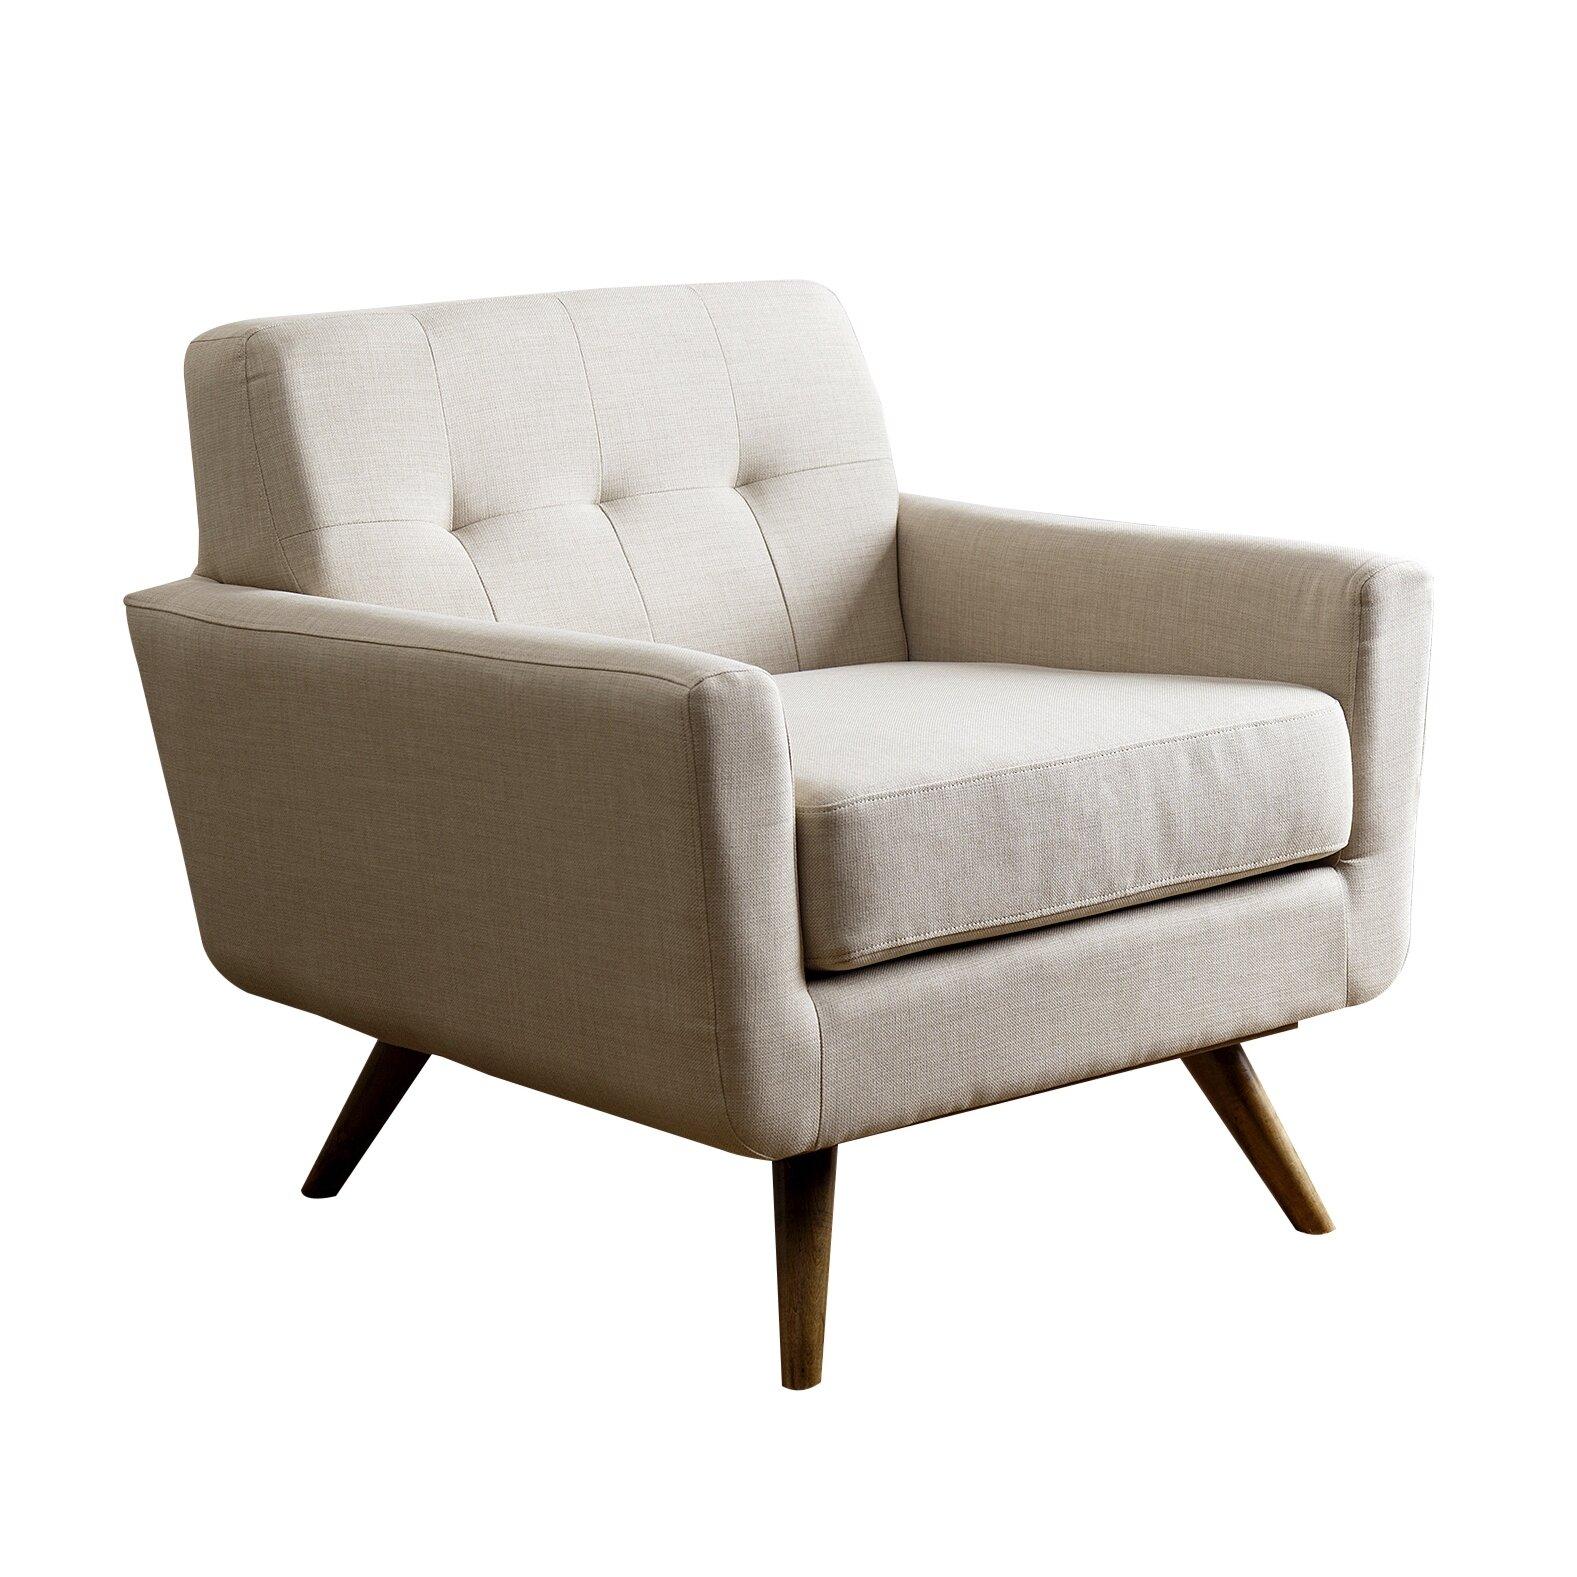 Comfortable arm chairs - Comfortable Arm Chairs 12